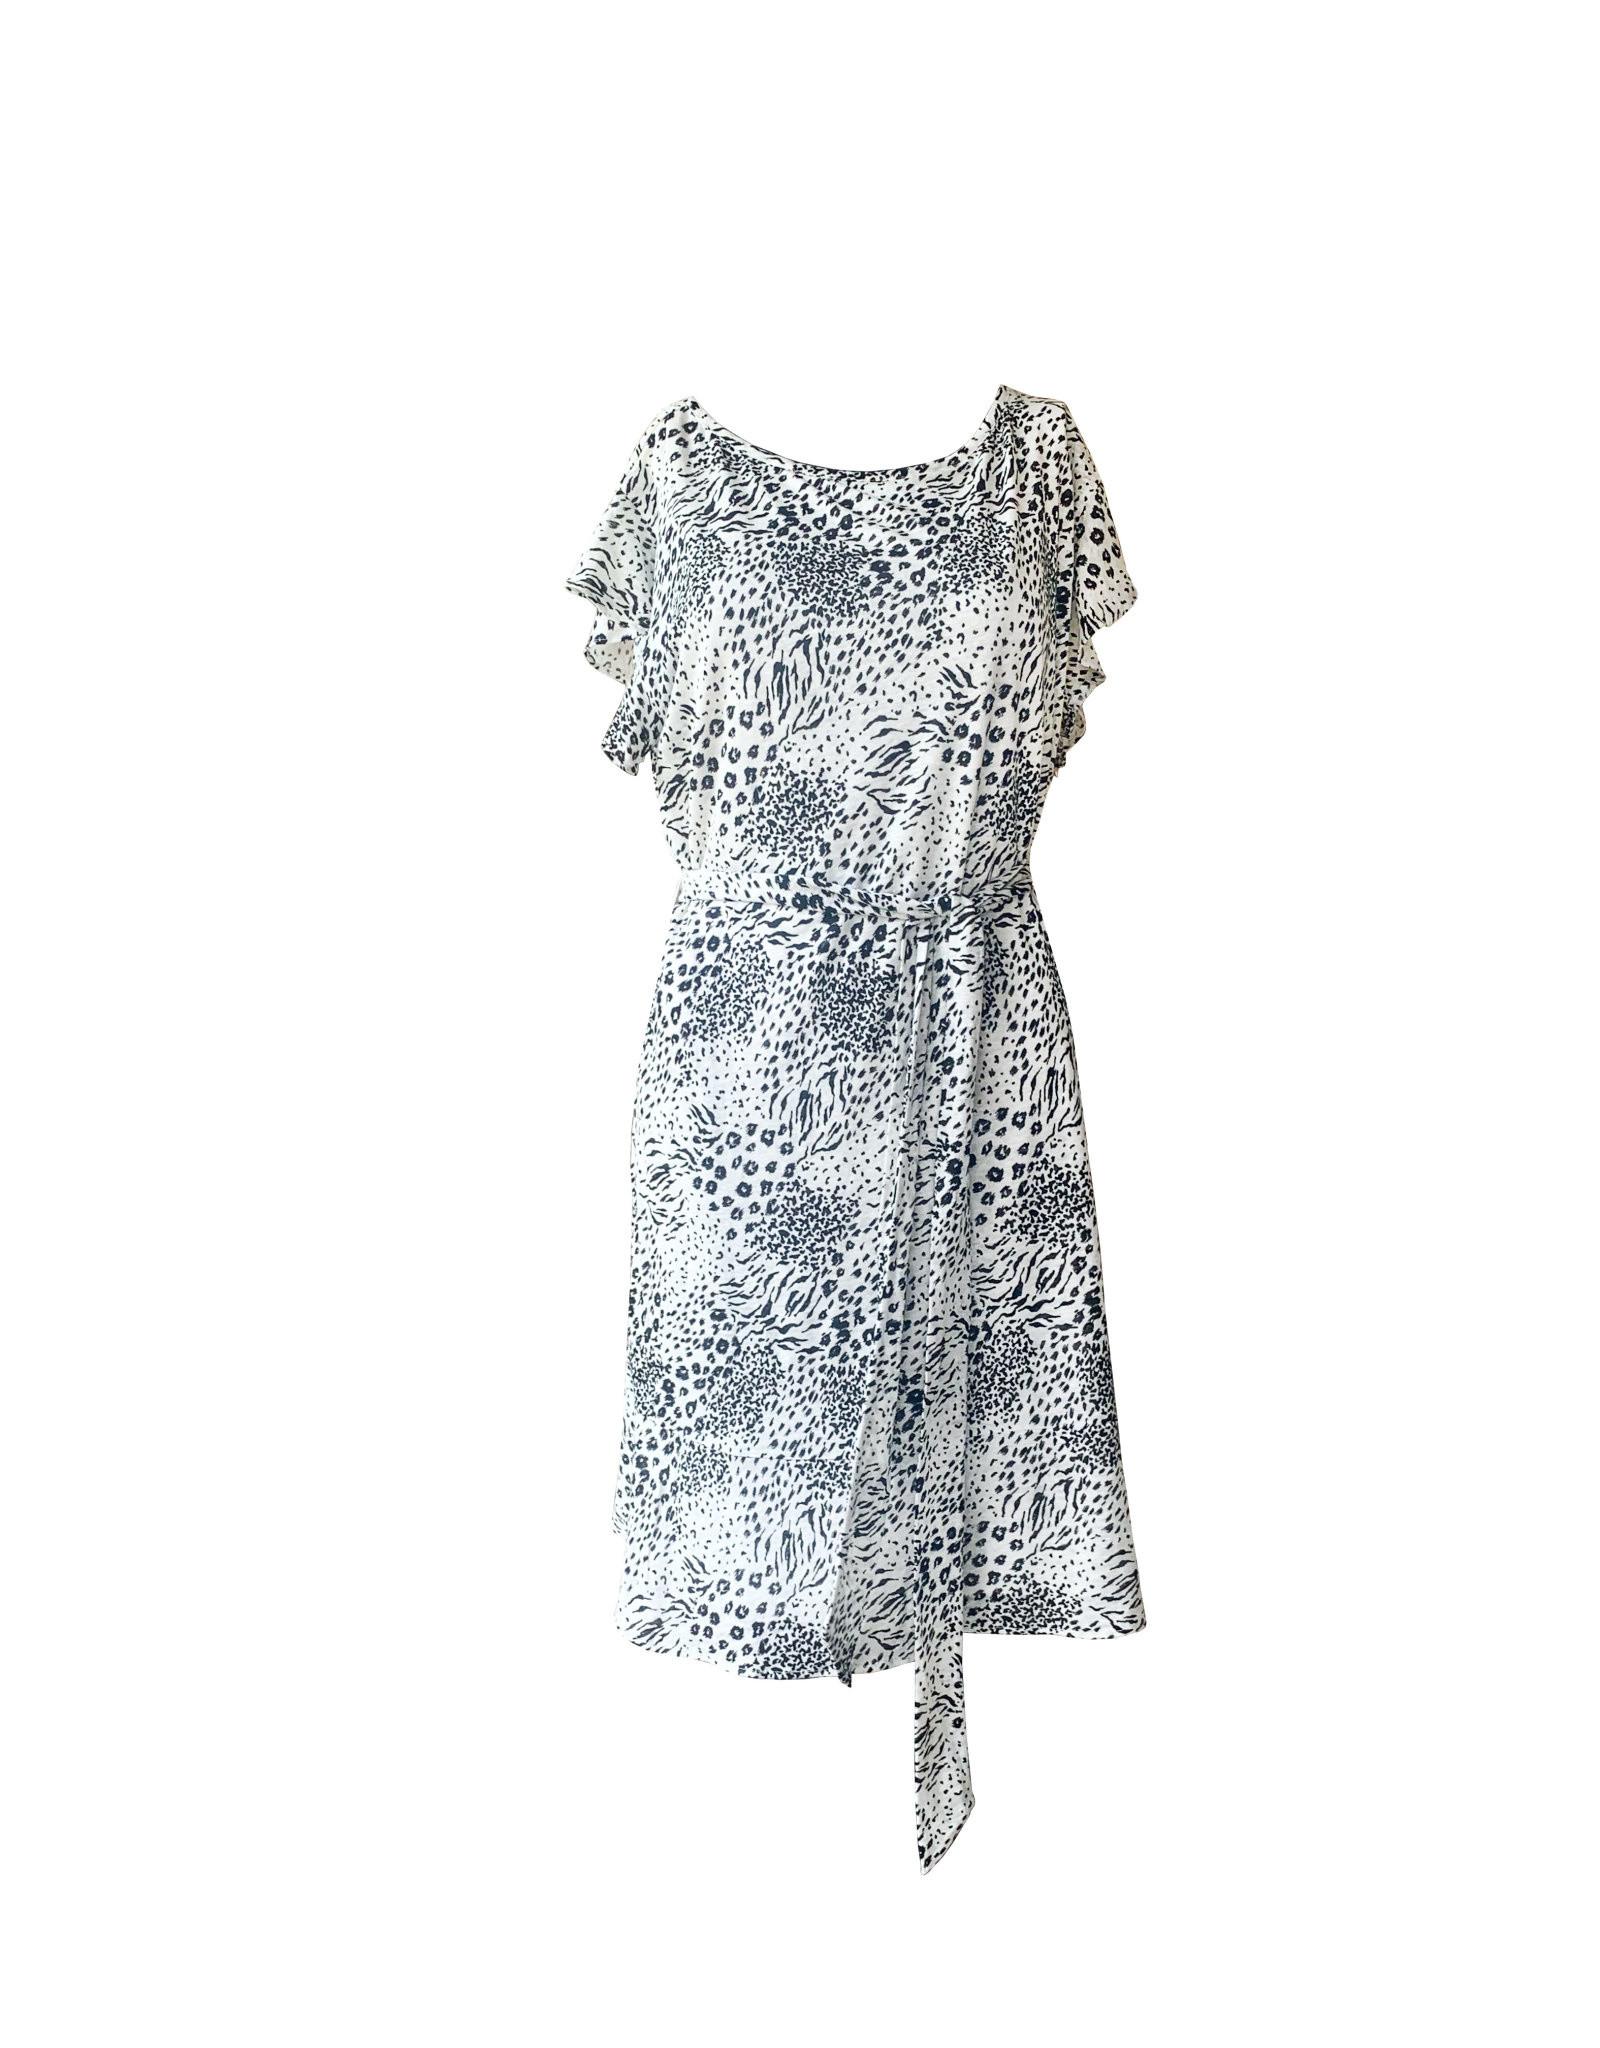 Joie Joie Anthea Animal Print Dress